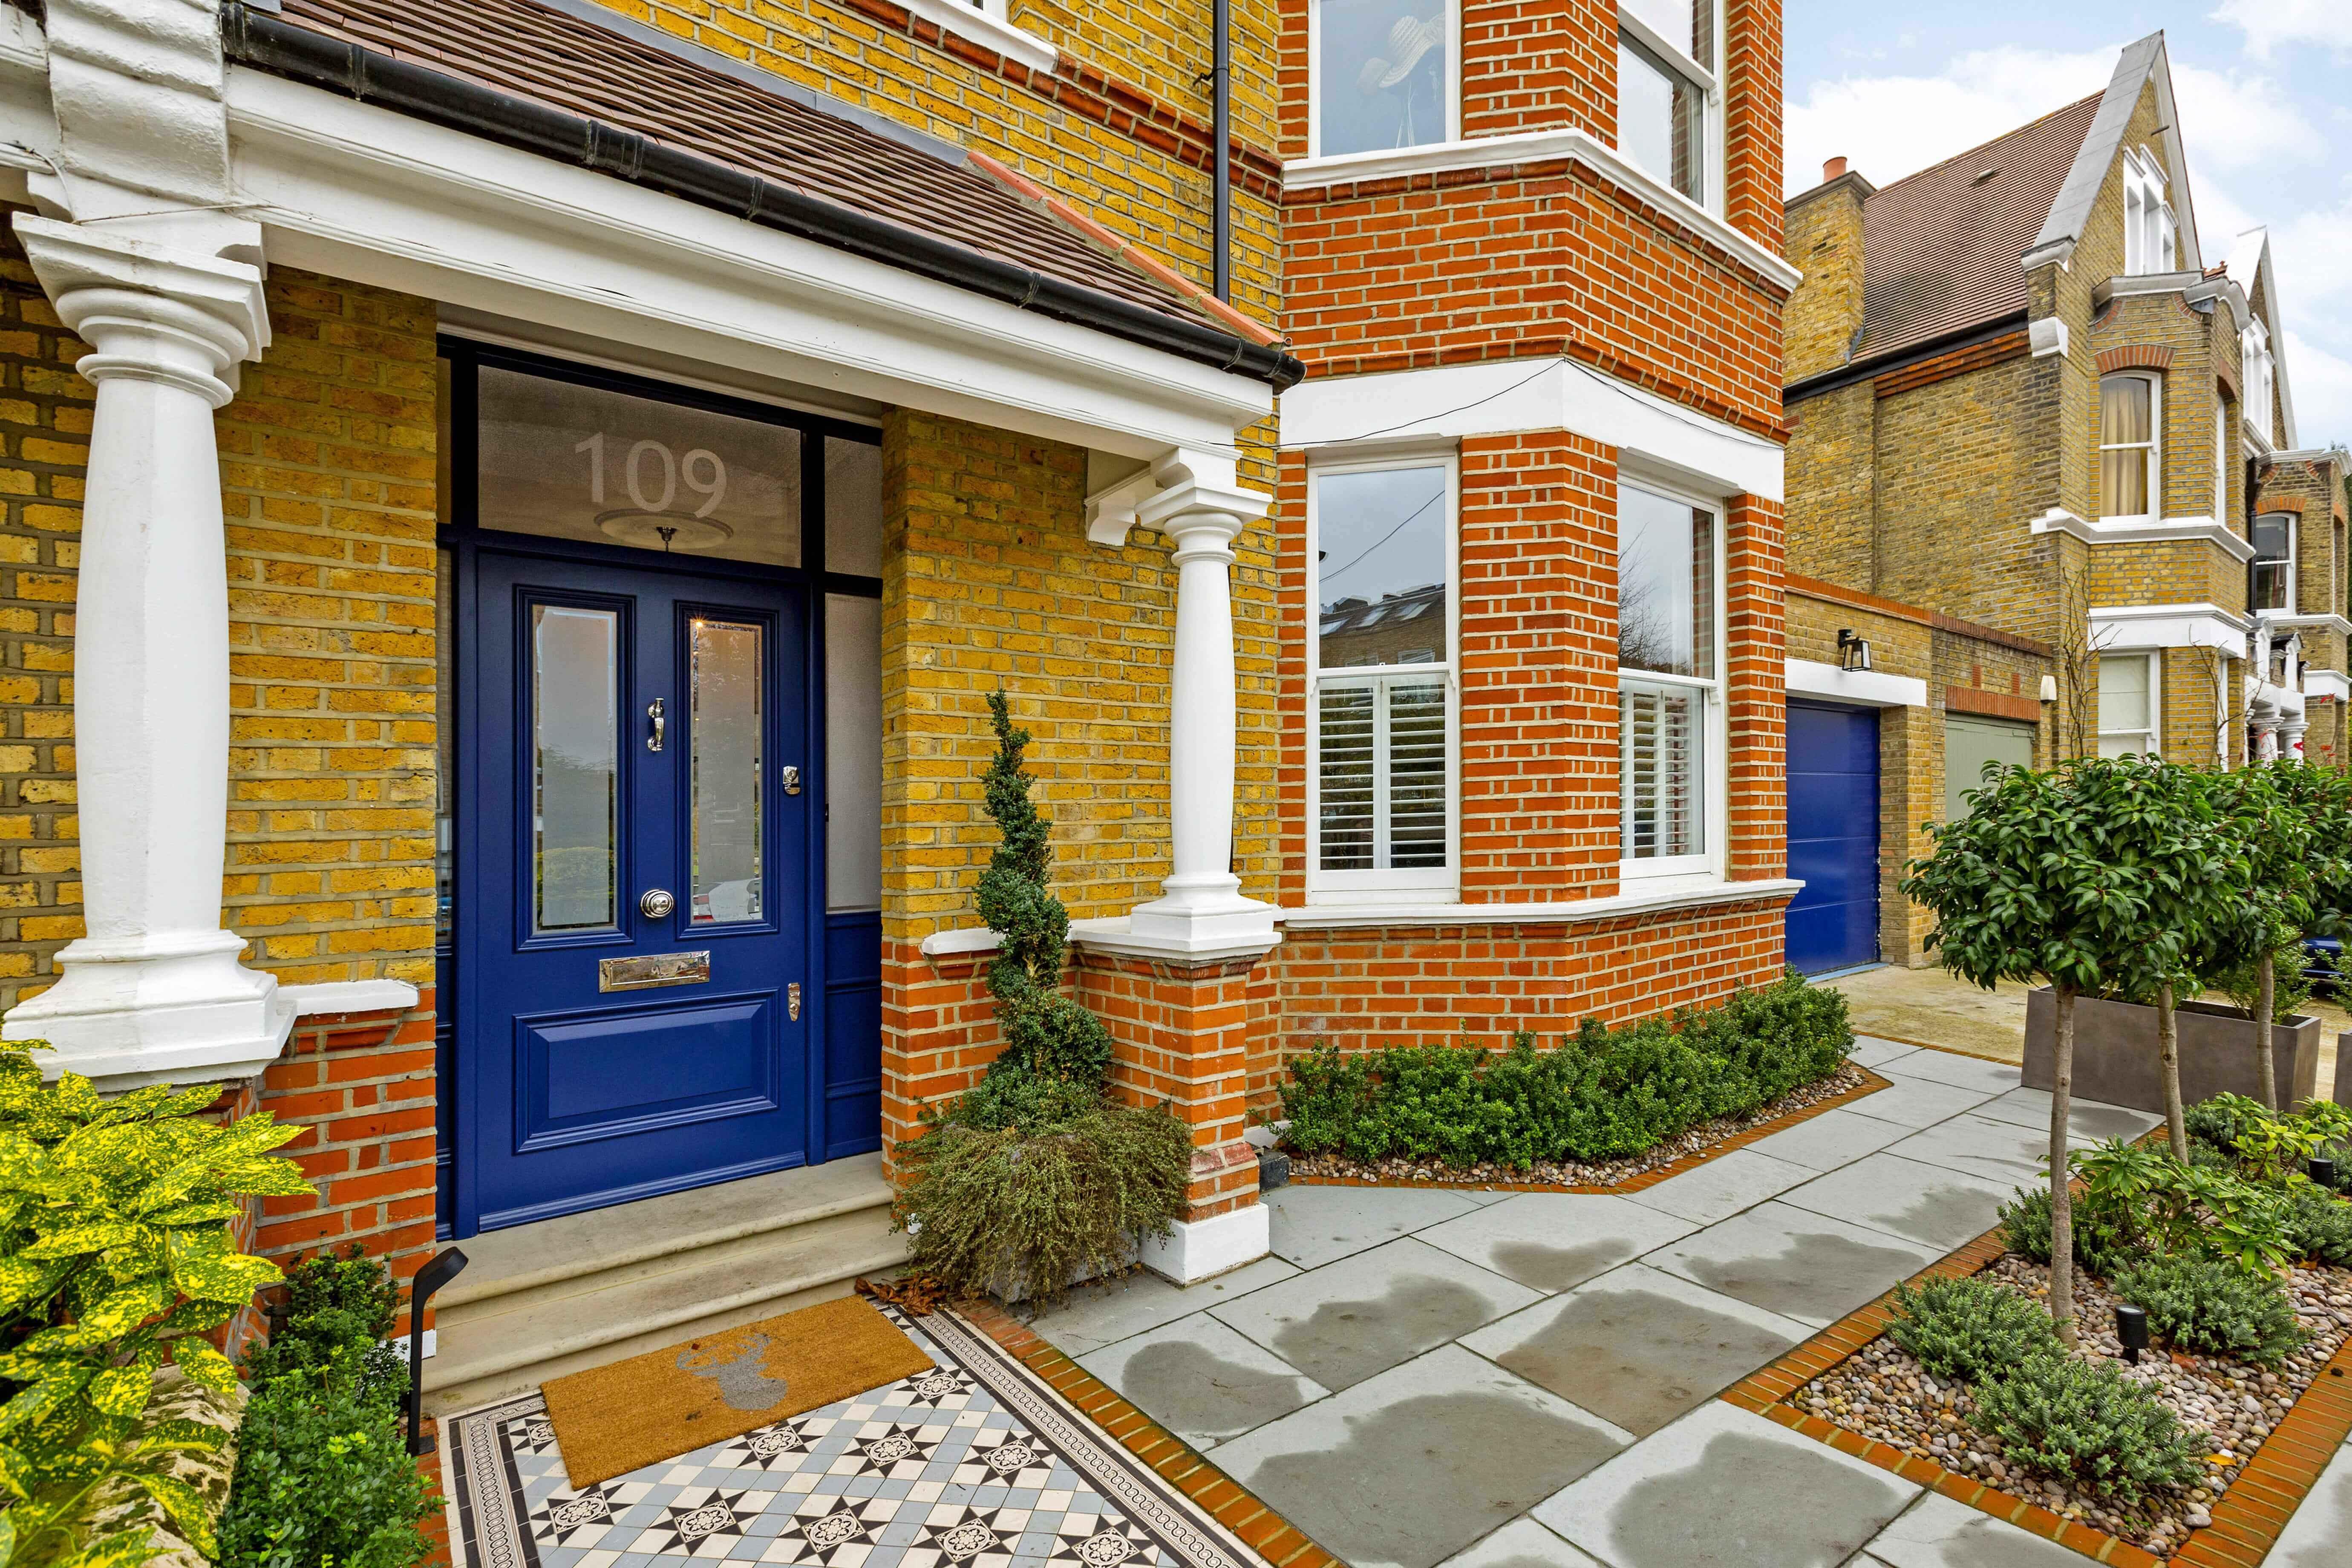 Edwardian style front door & sash windows